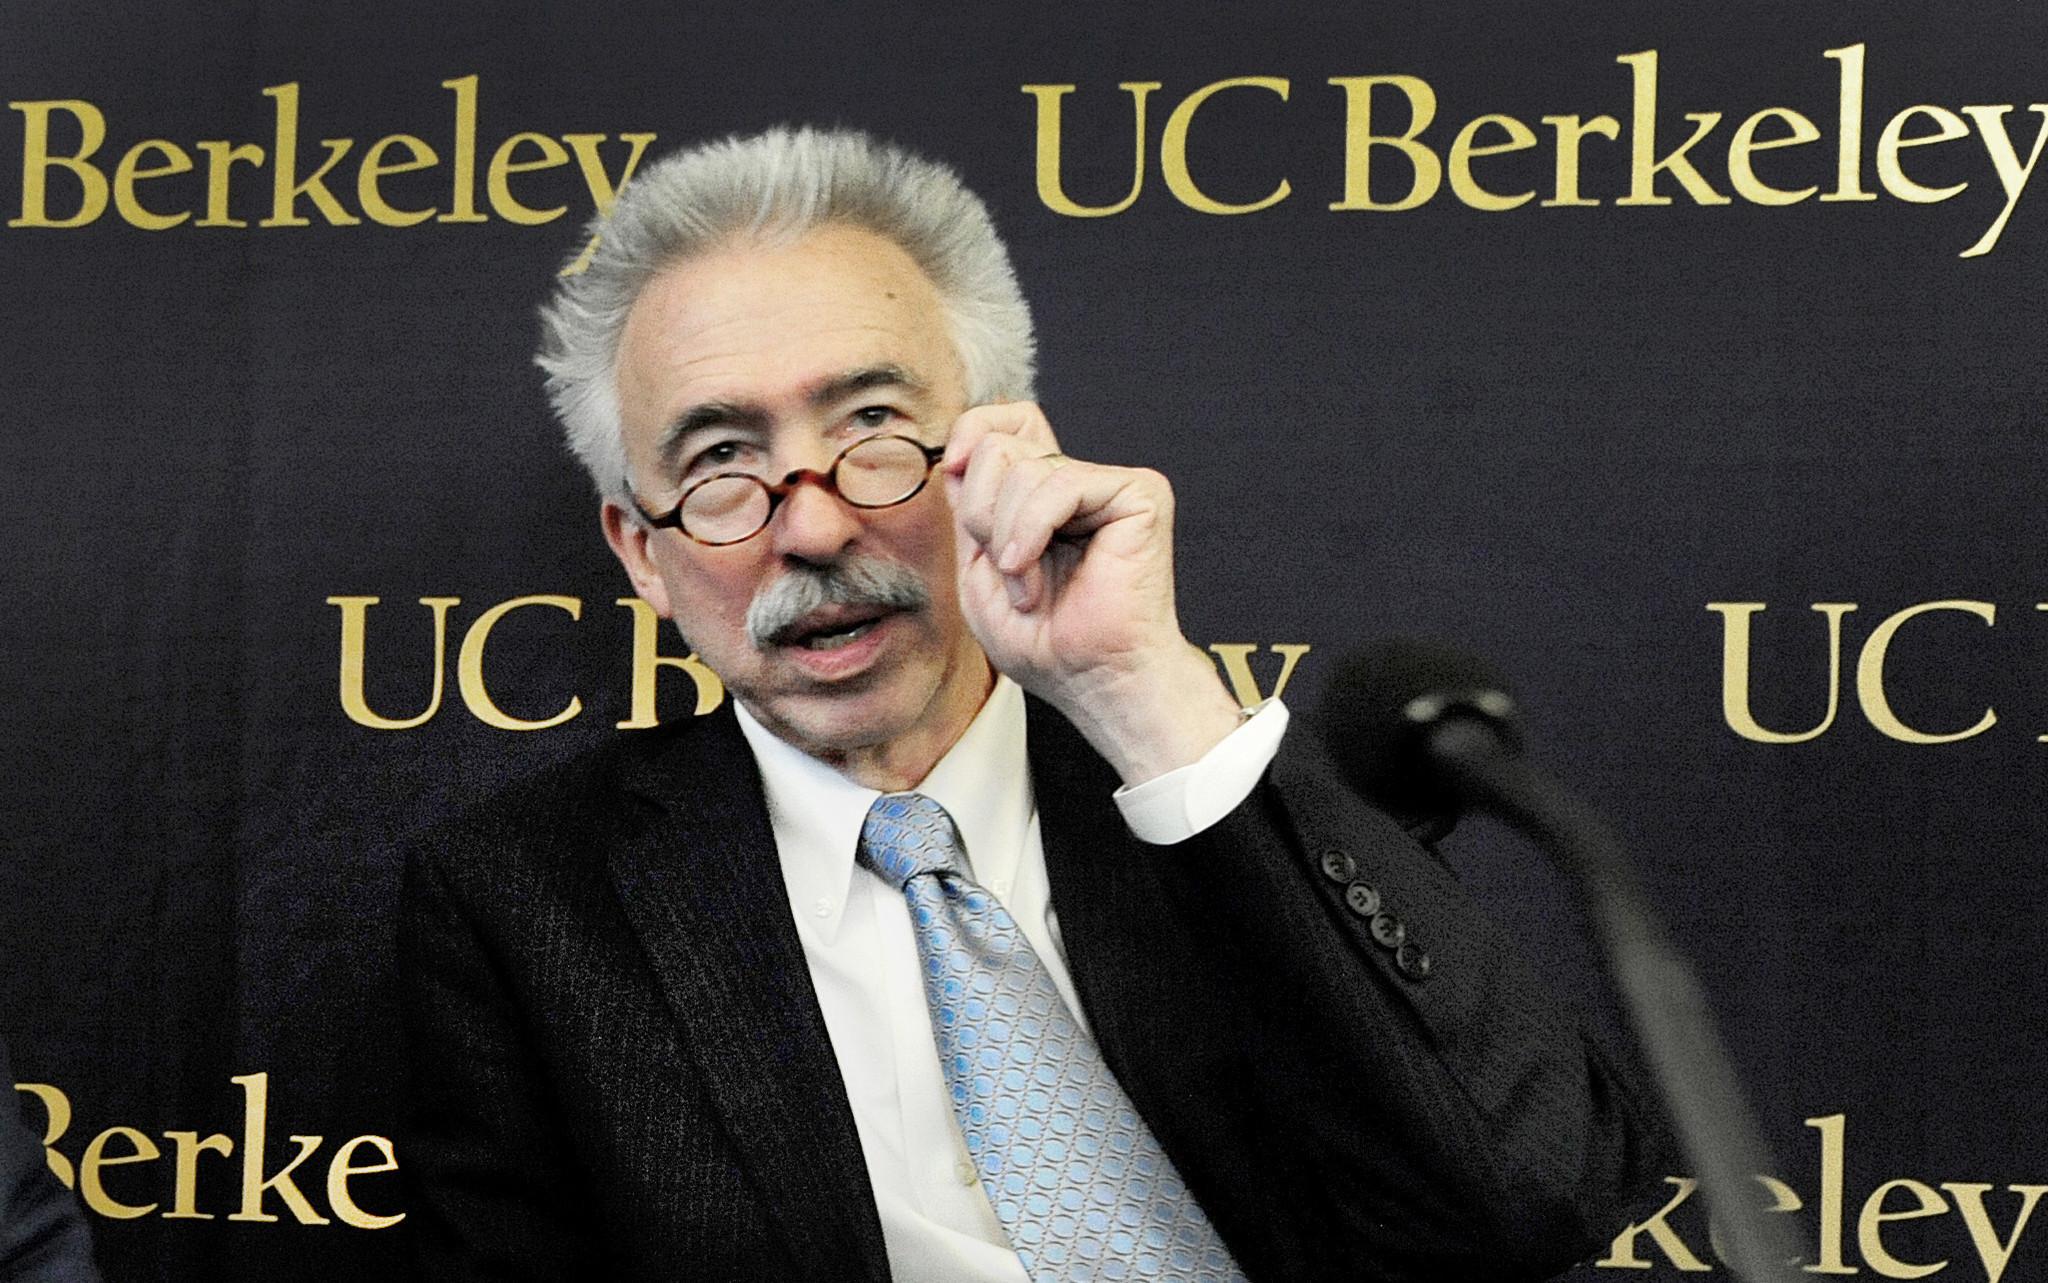 Uc berkeley decision date in Australia